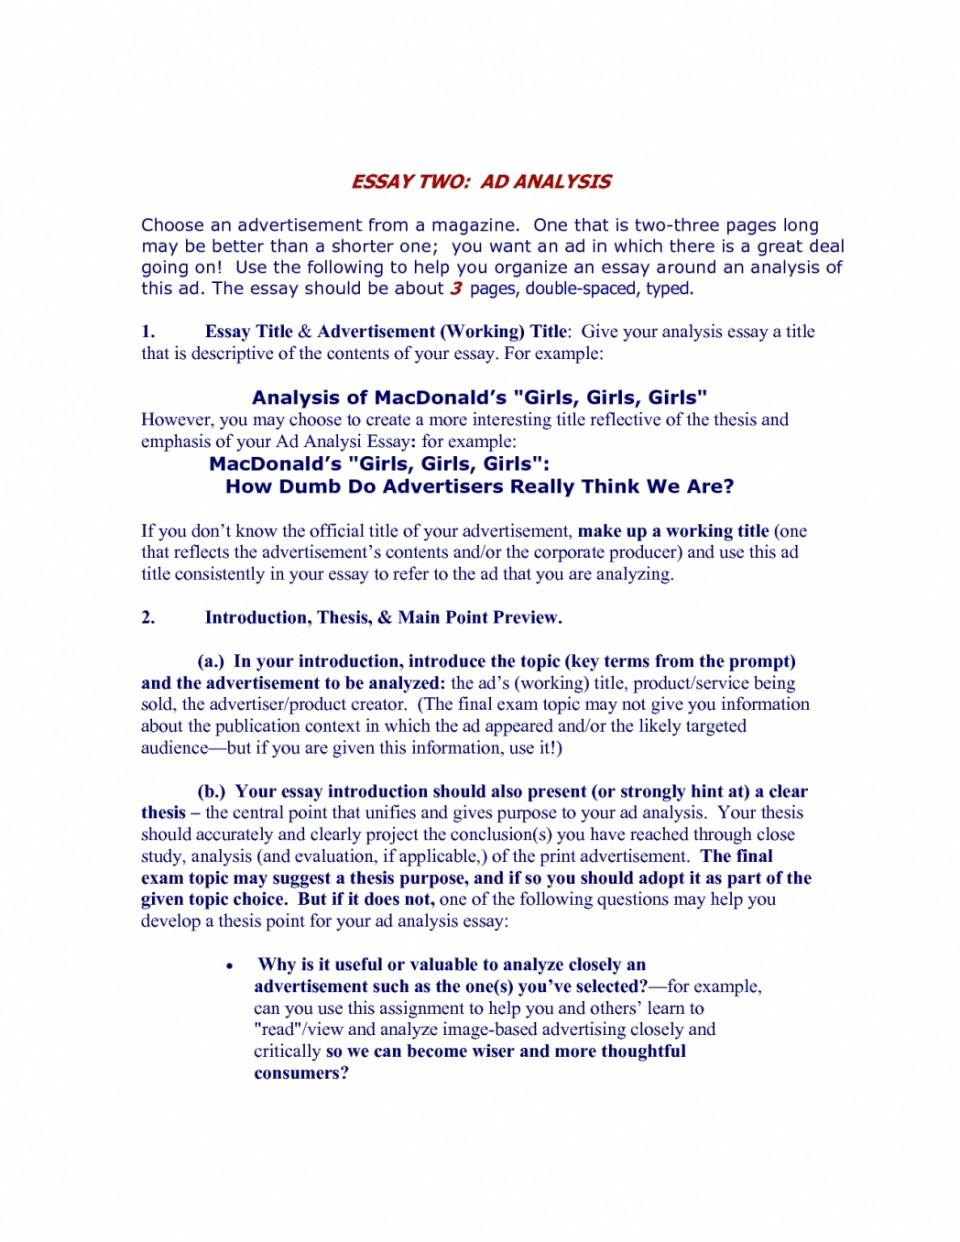 014 explication essay example elizabethan poetry how to